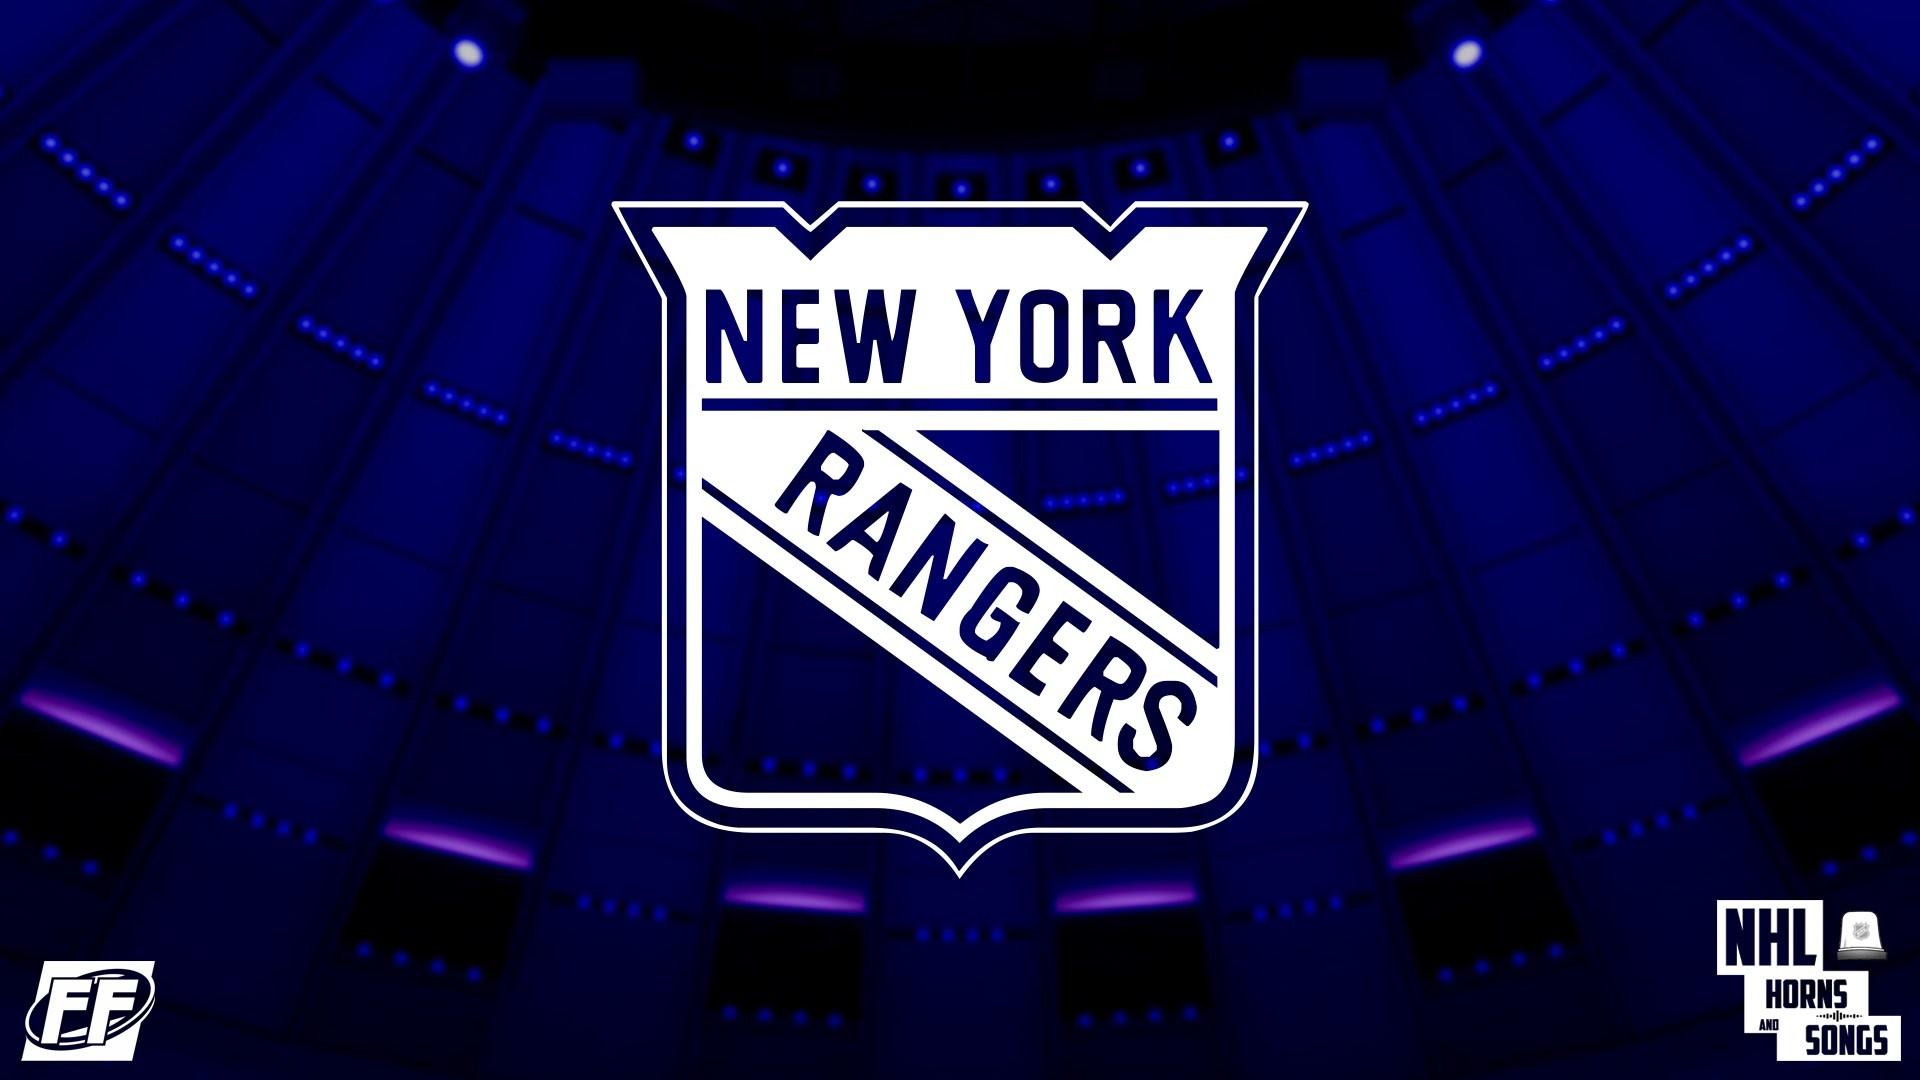 Hockey player New york rangers Henrik Lundqvist wallpapers and